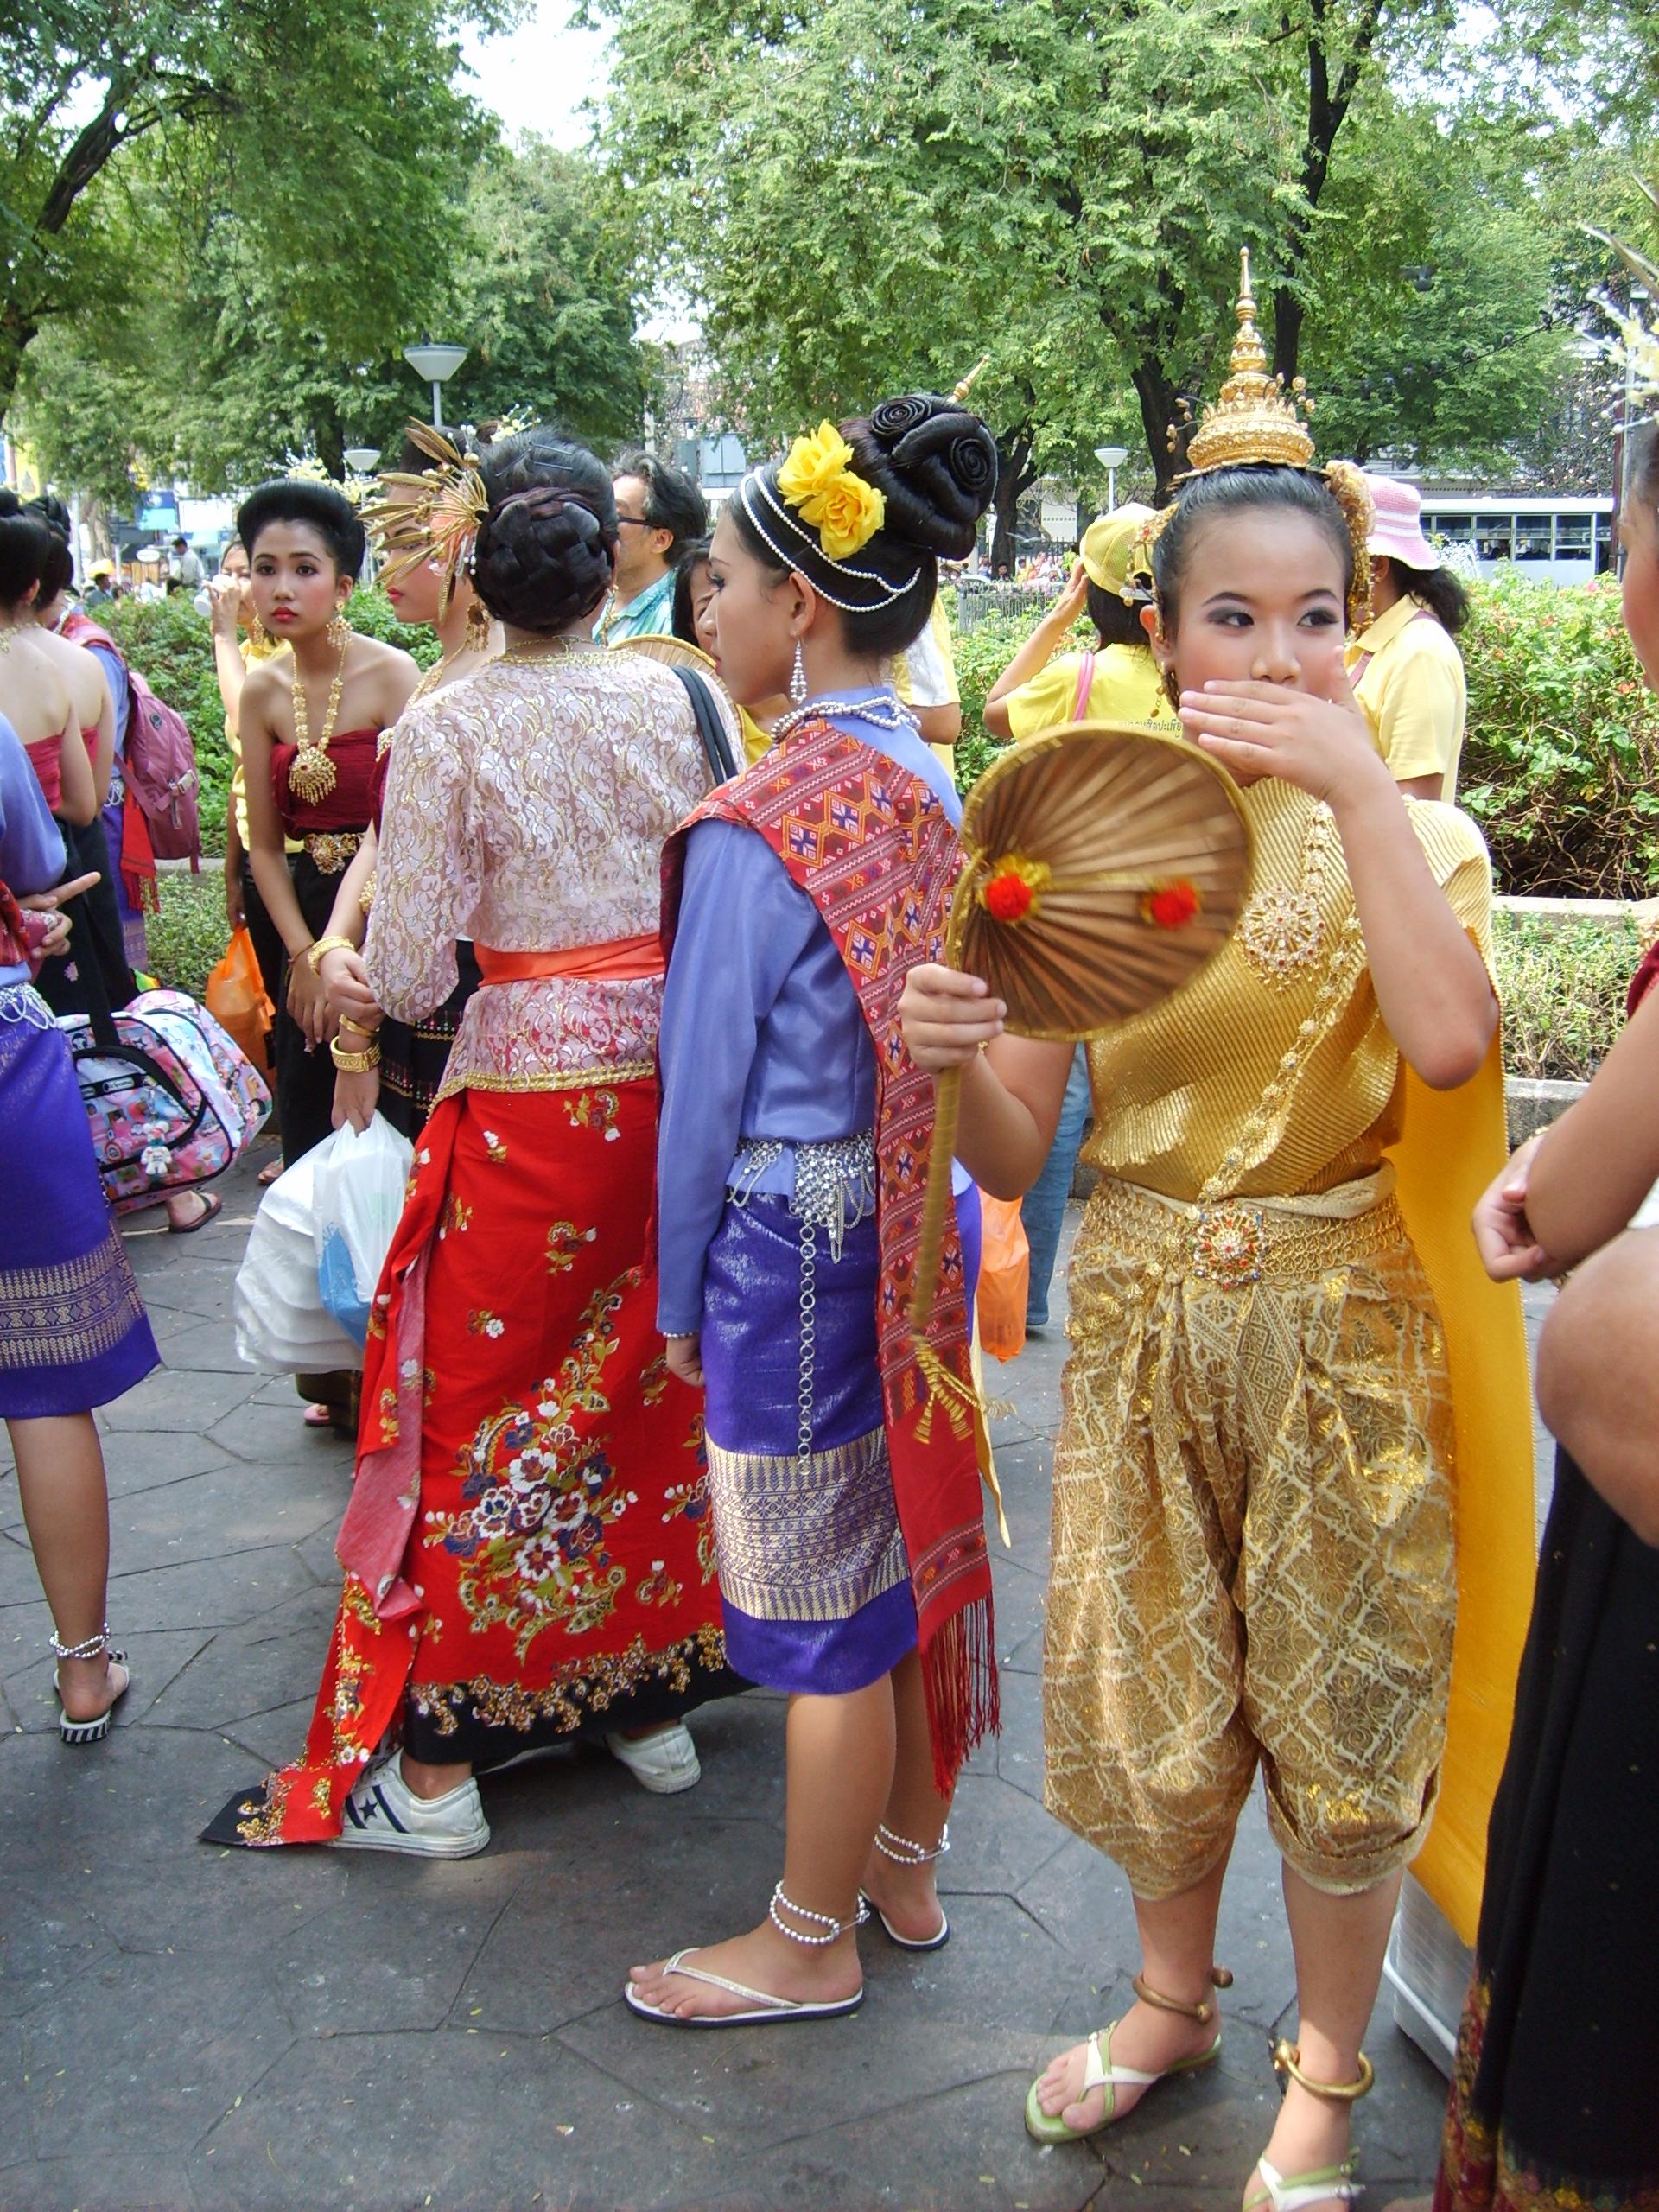 Thai girls in traditional clothing - Free Stock Photos ::: LibreShot